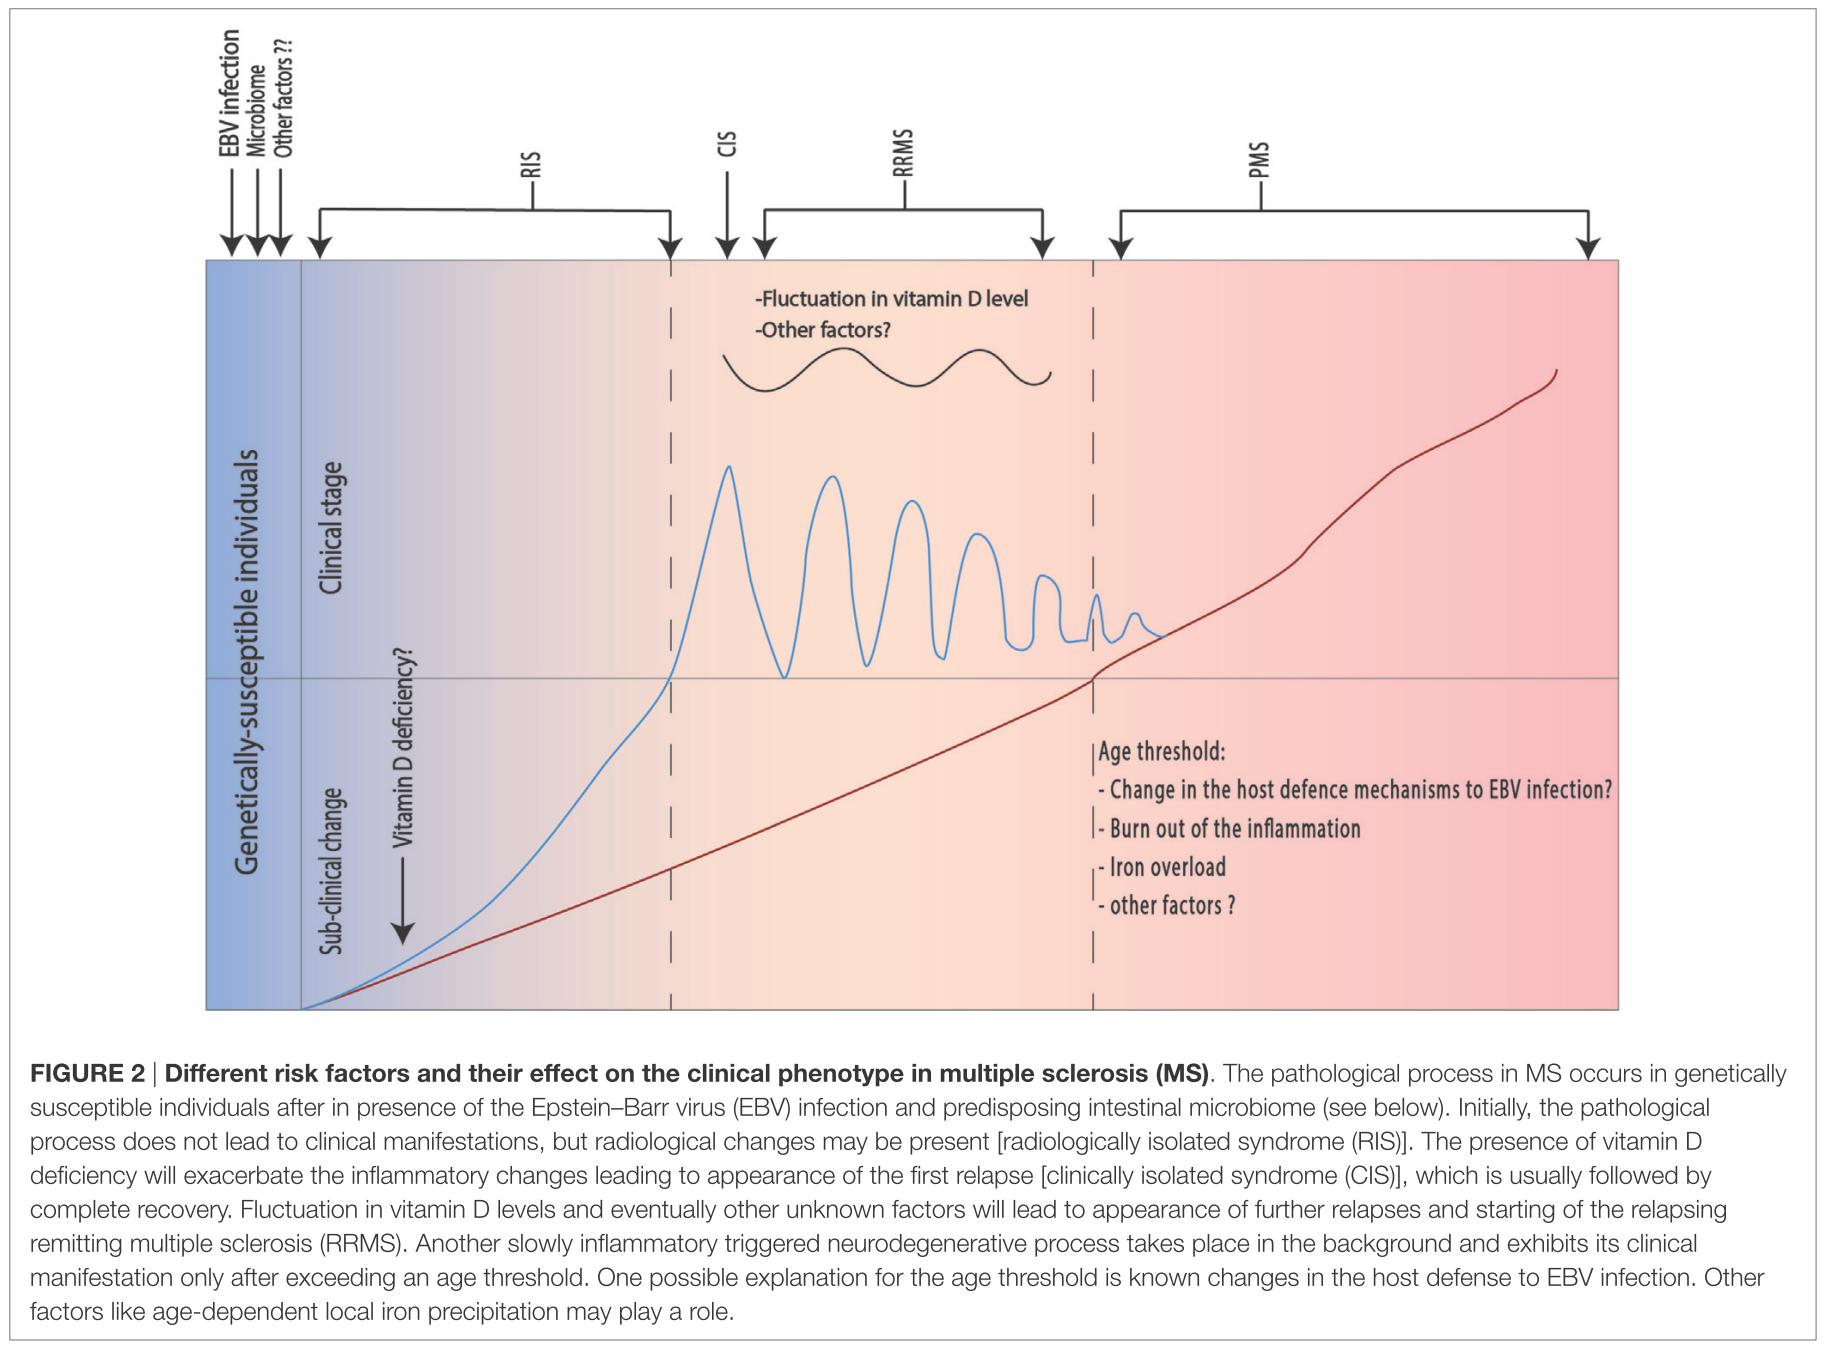 PPMS: primary-progressive multiple sclerosis 1次性進行型多発性硬化症